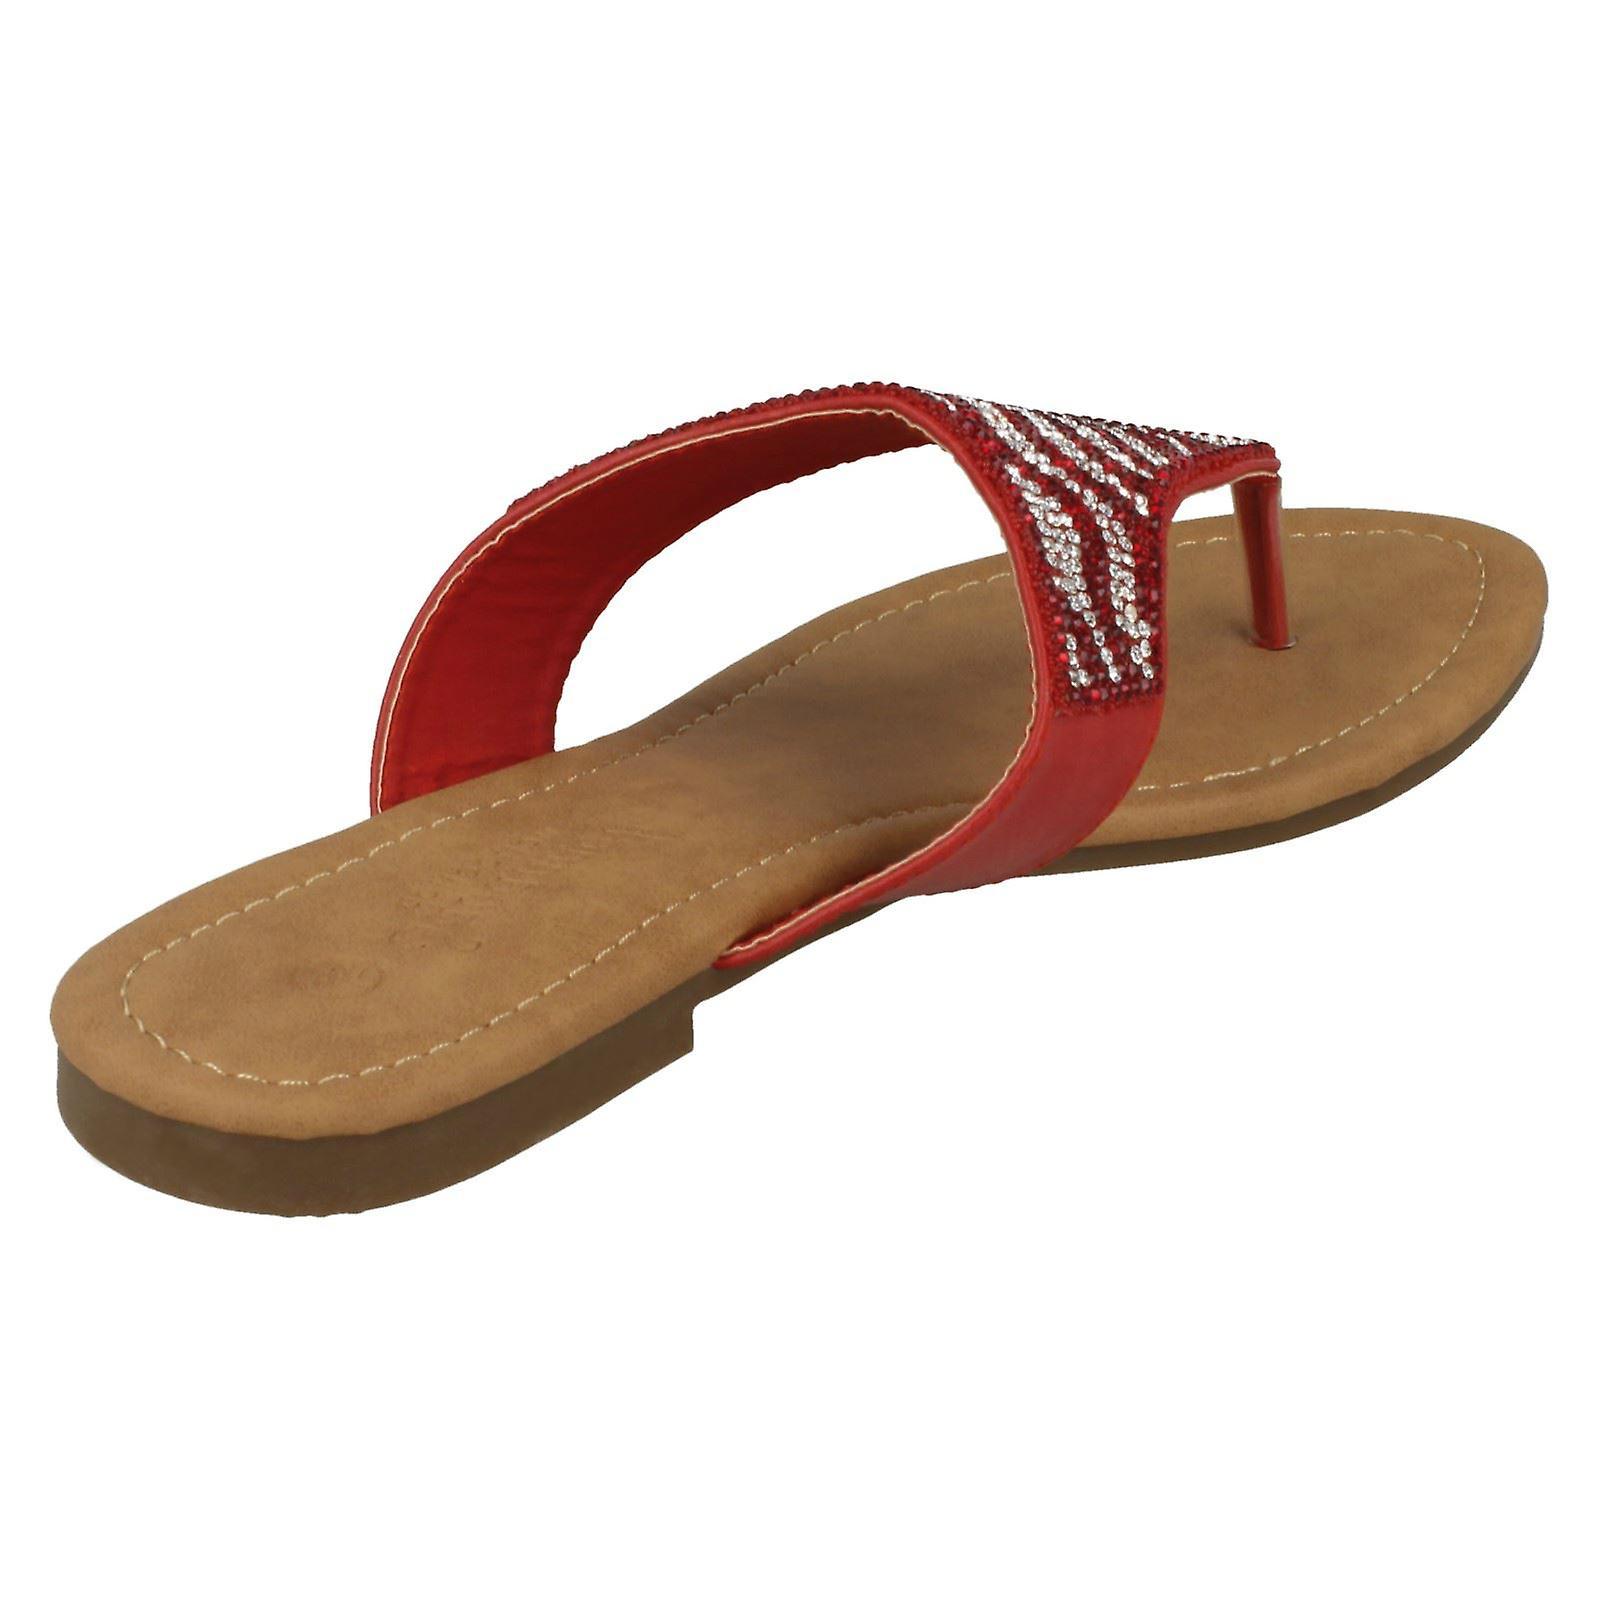 Ladies Savannah Flat Diamante Toe innlegget sandaler F000010